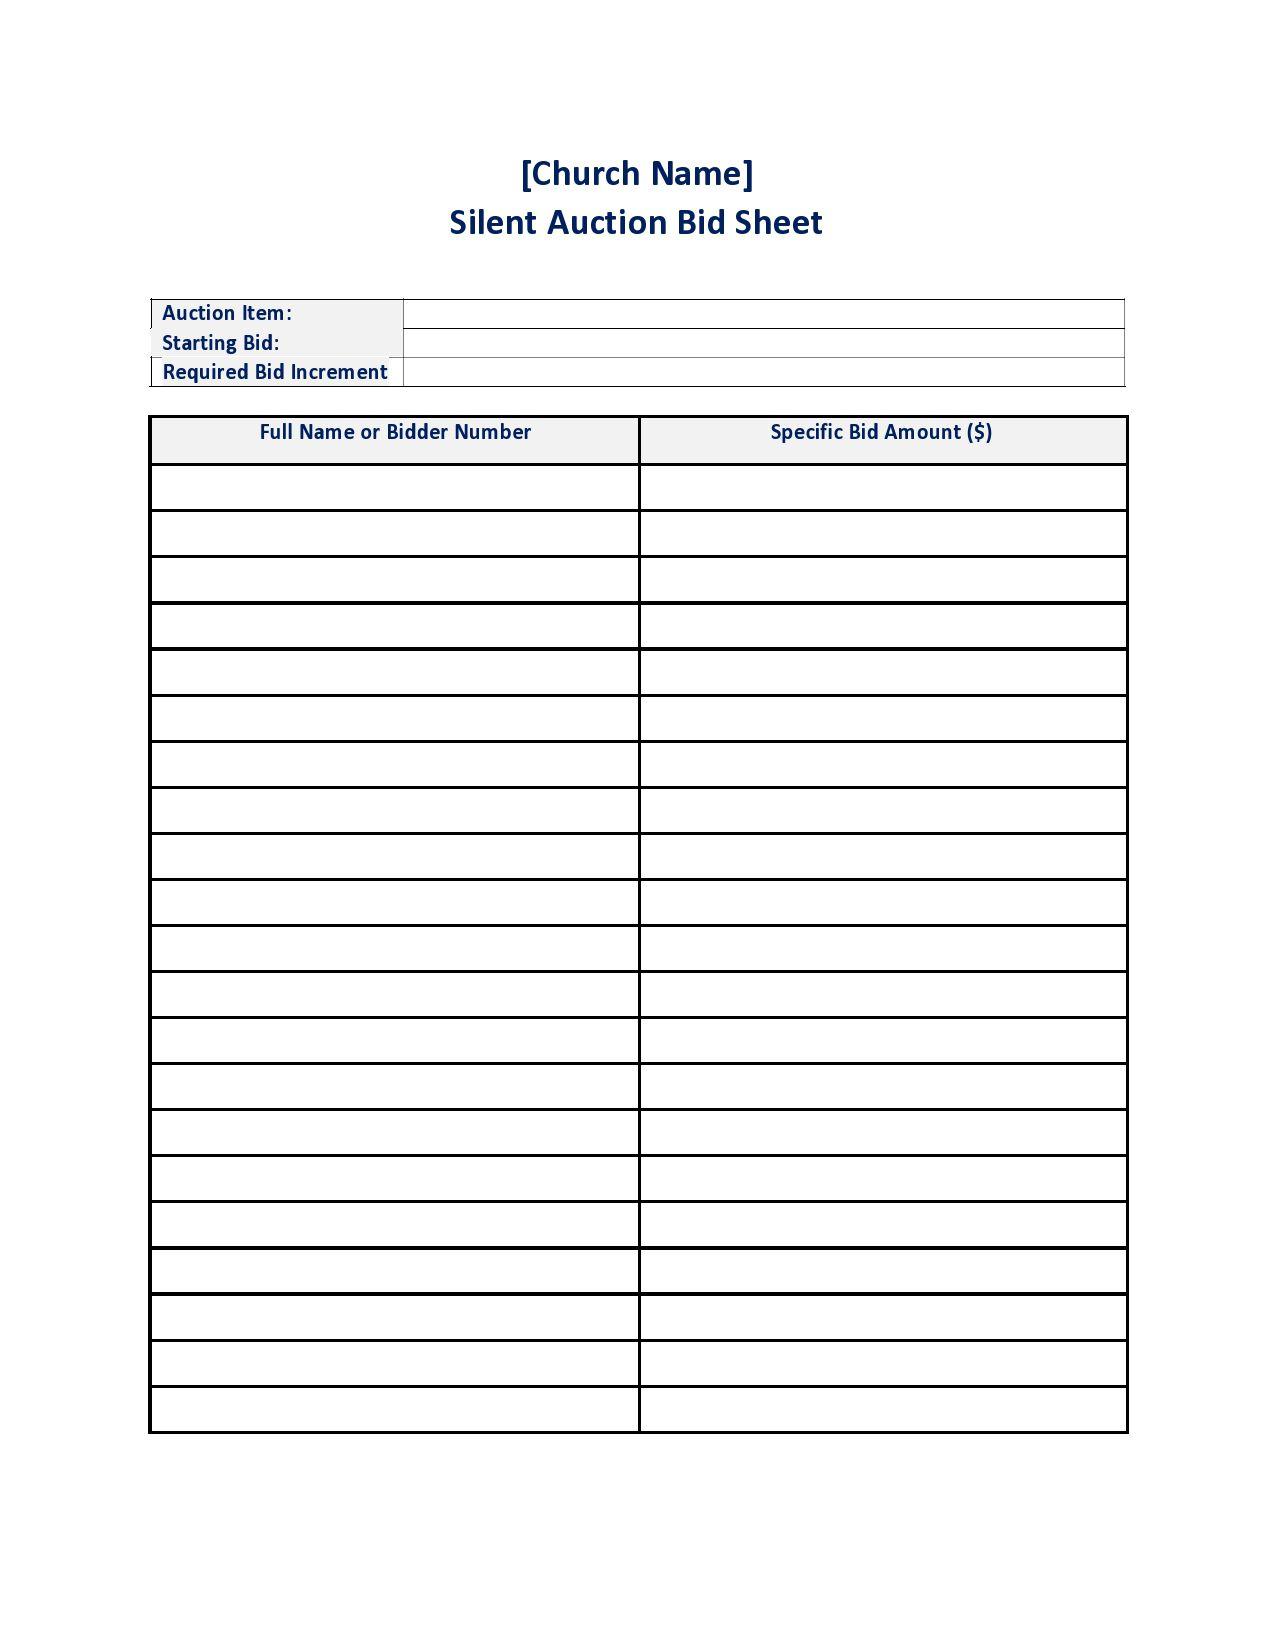 002 Dreaded Silent Auction Bid Sheet Template Free High Def  Pdf DownloadFull